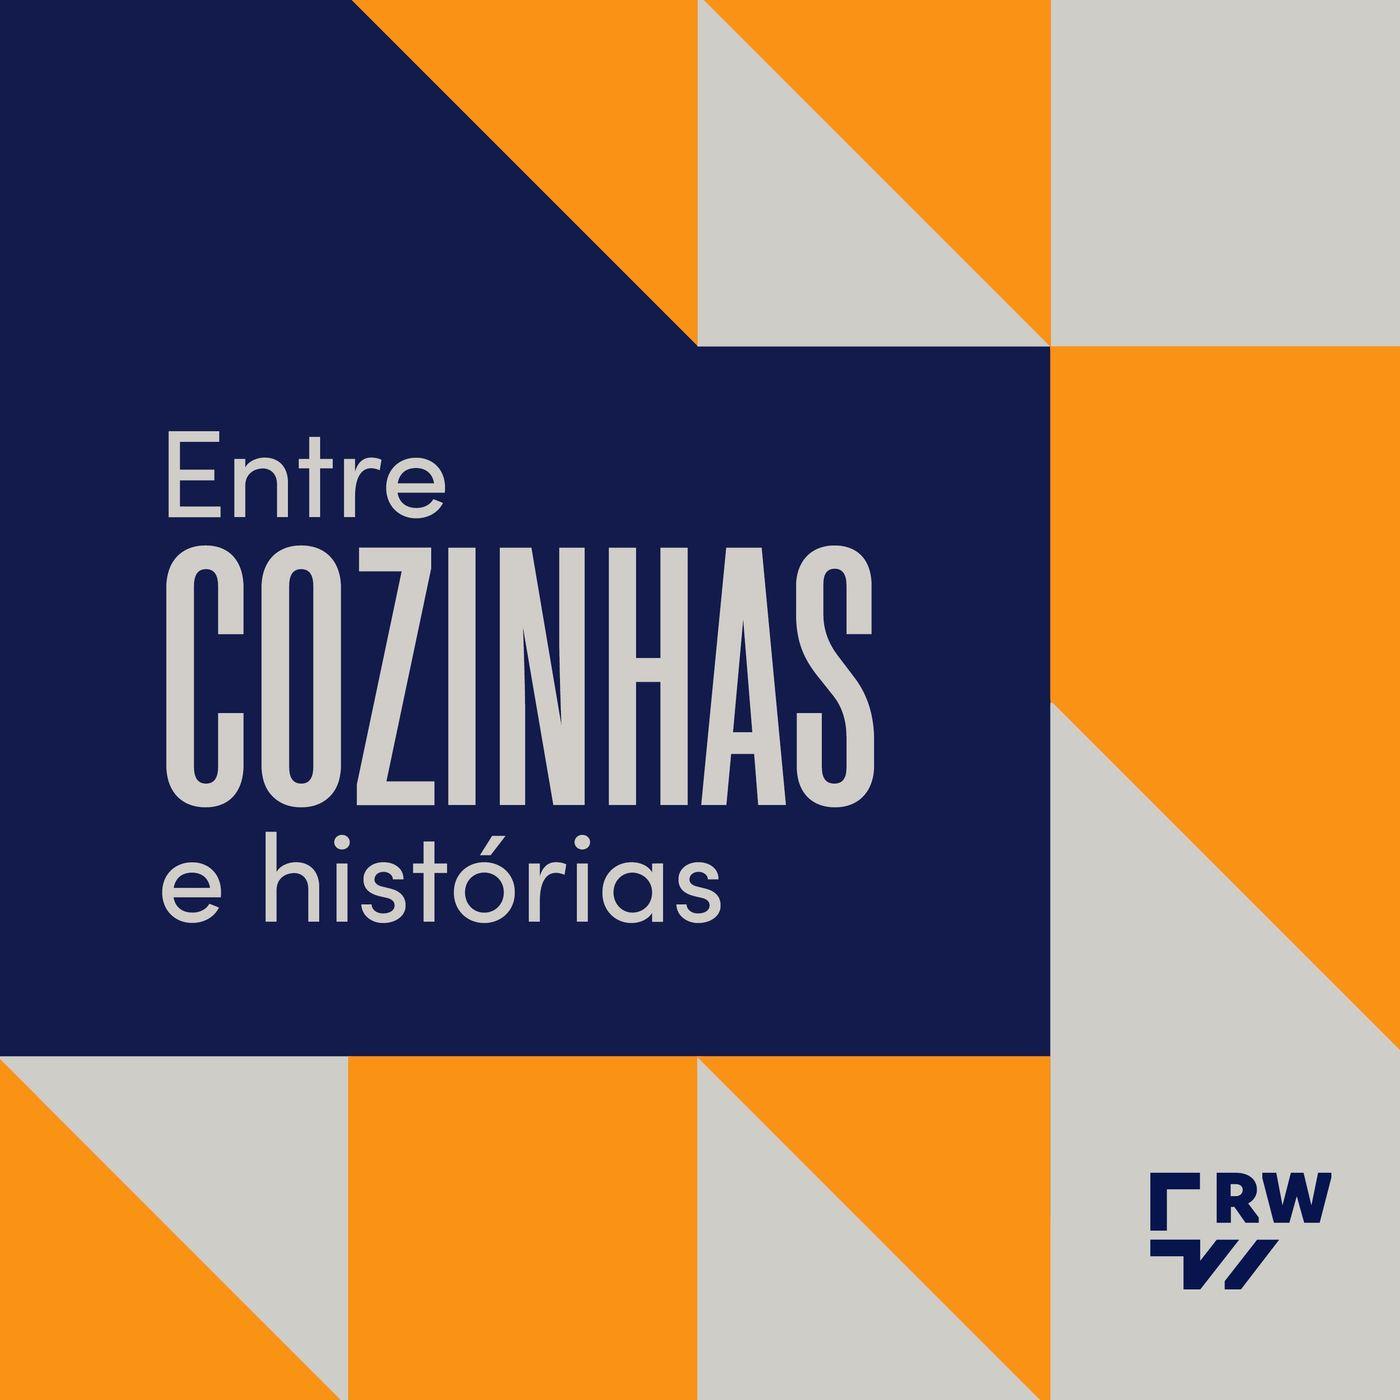 065   Lista mostra os sabores da moda no Brasil e no mundo